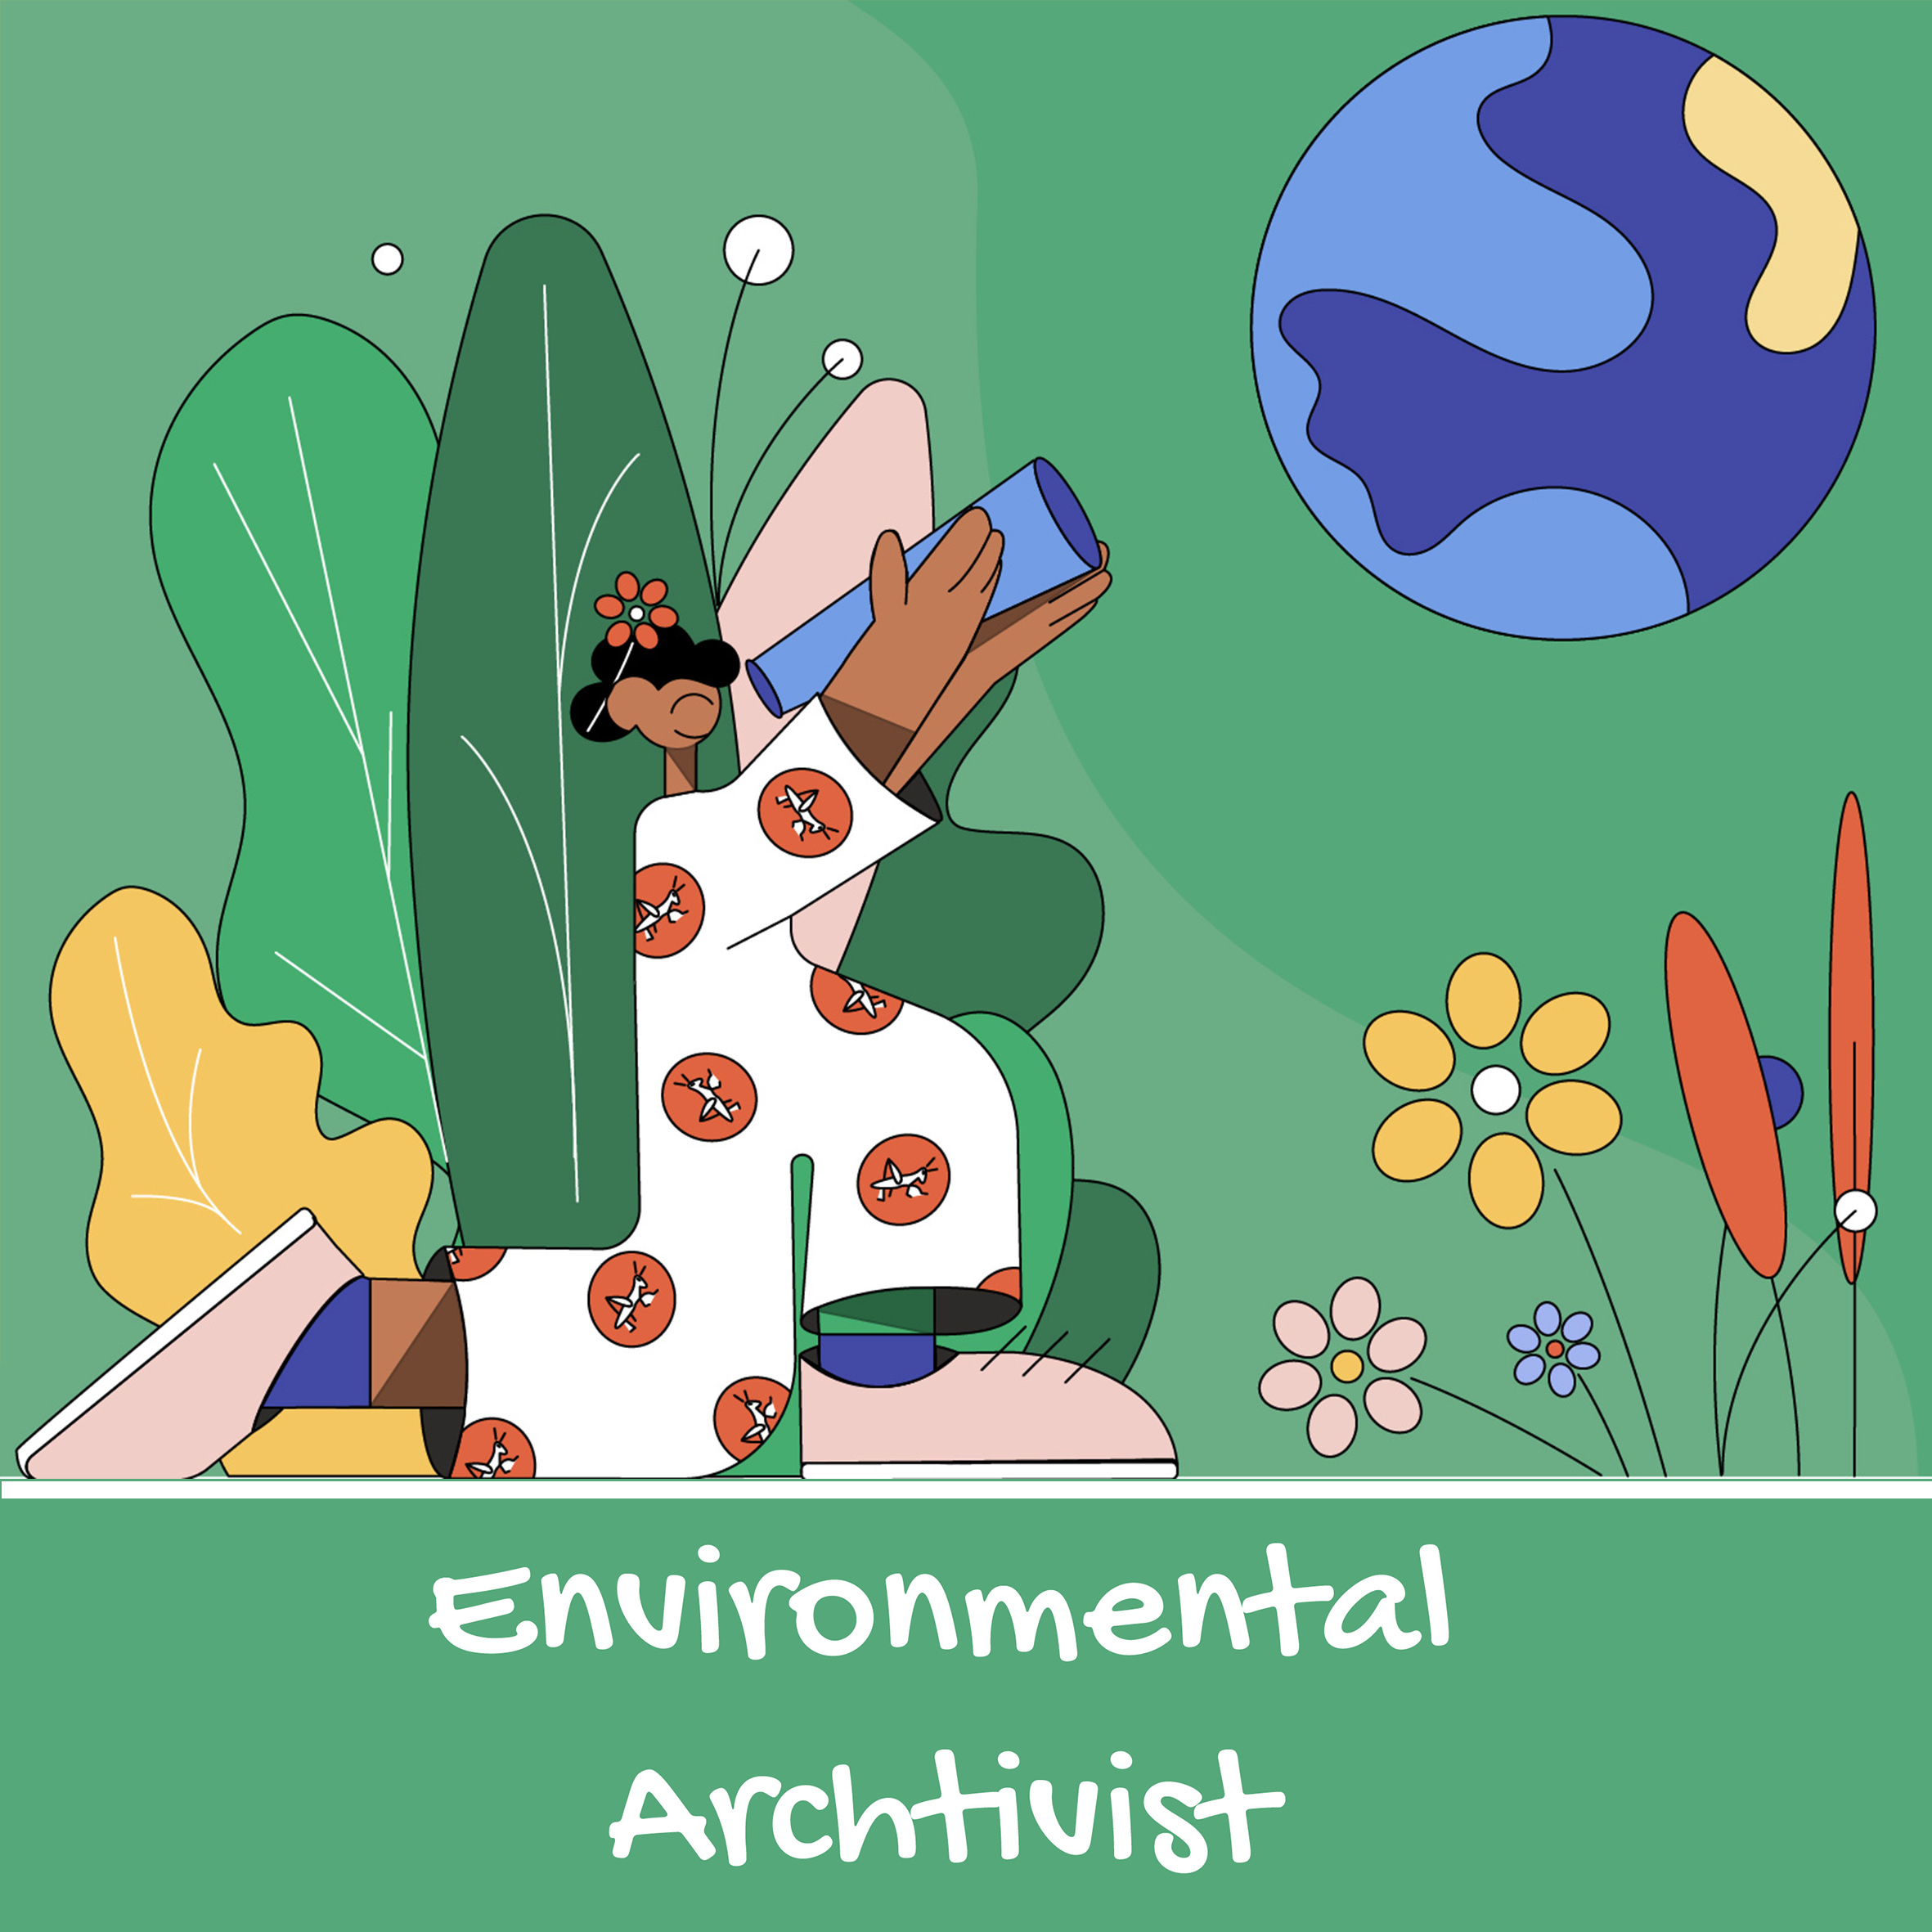 Archtivist-illustration-Nyasha HARPER-MICHON_05